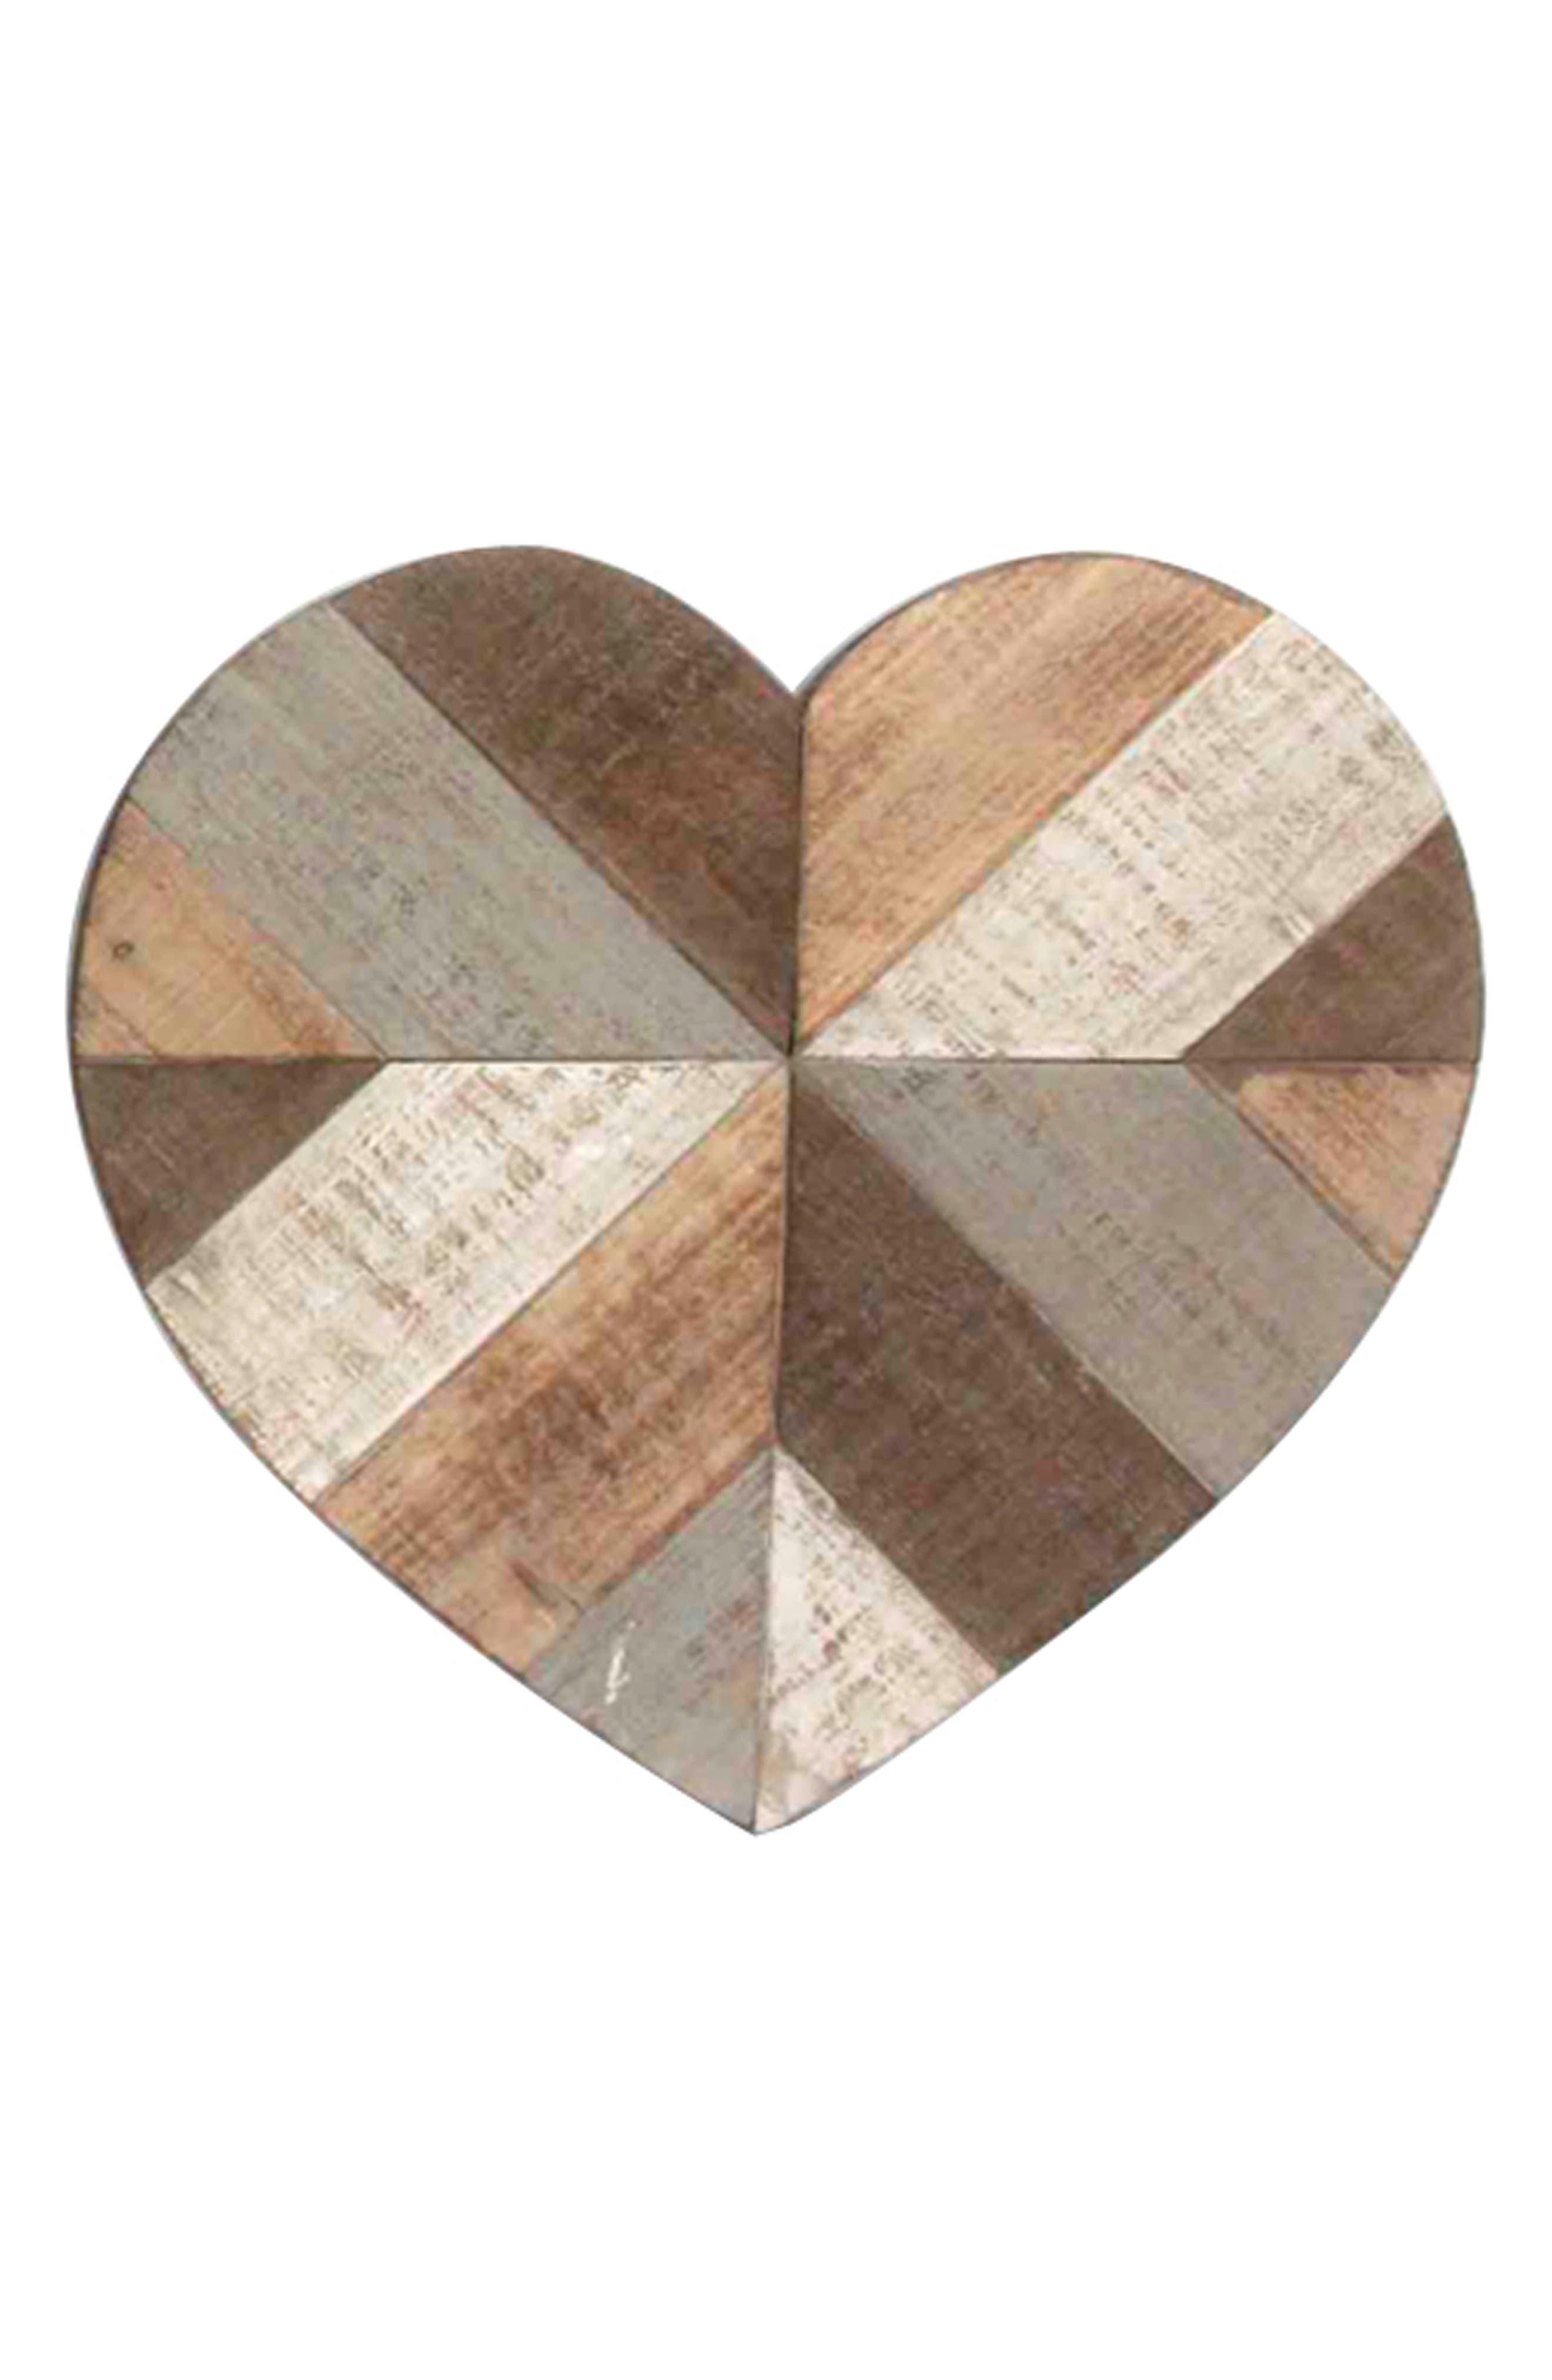 Alternate Image 1 Selected - Crystal Art Gallery Wooden Heart Wall Art